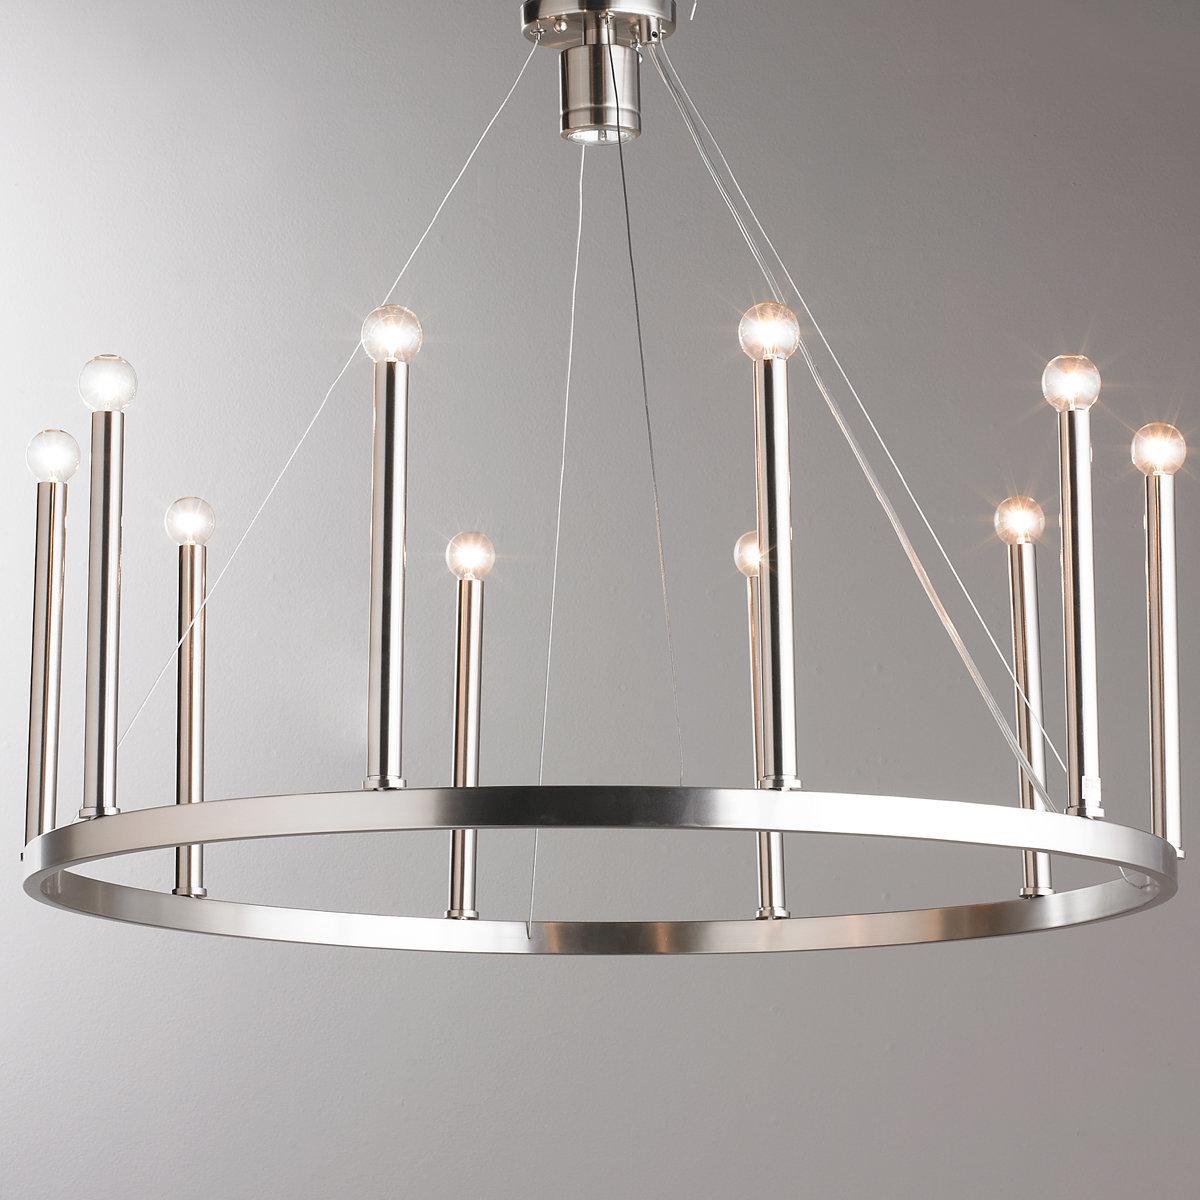 Euro light j 9161-8 chandelier